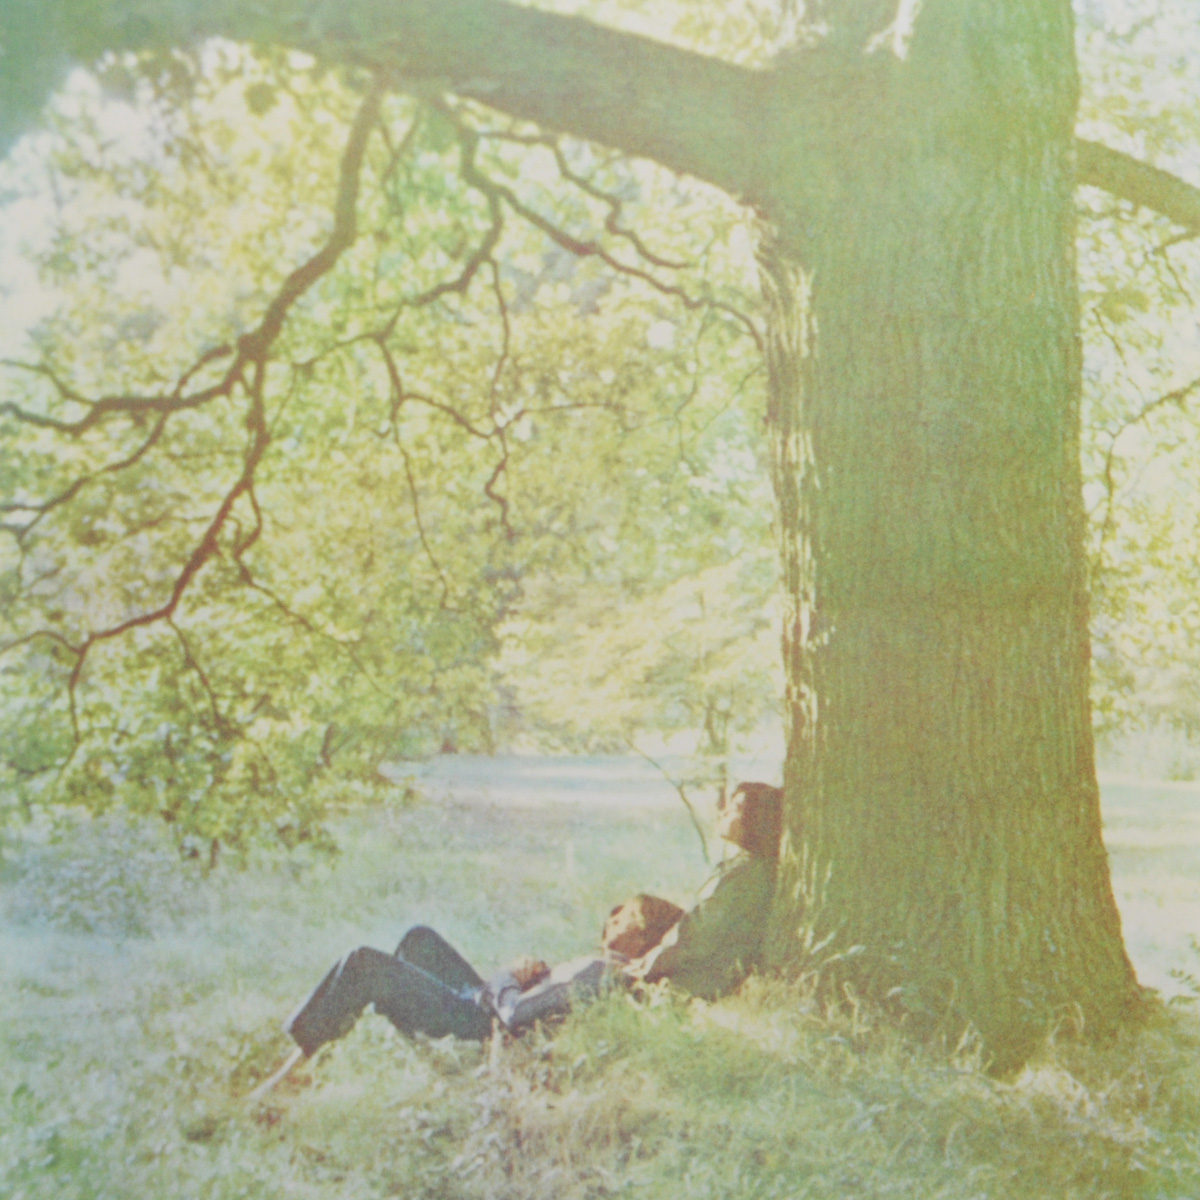 Джон Леннон John Lennon. Plastic Ono Band (LP) джон леннон john lennon lennon 9 lp